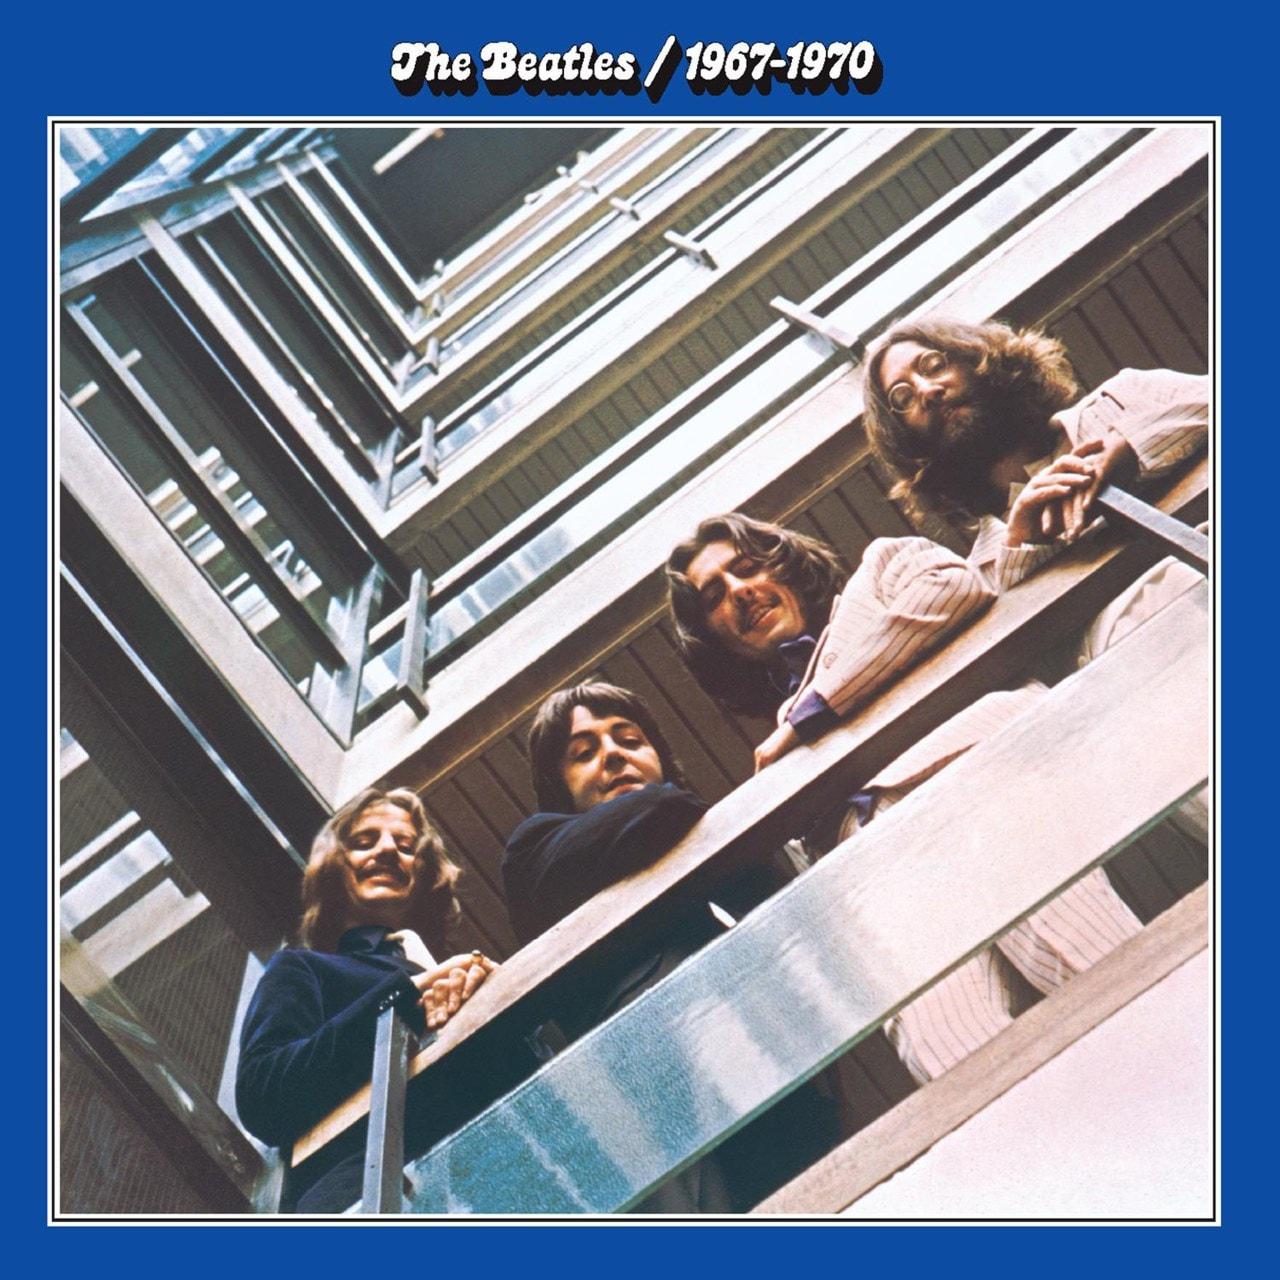 The Beatles: 1967-1970 - 1